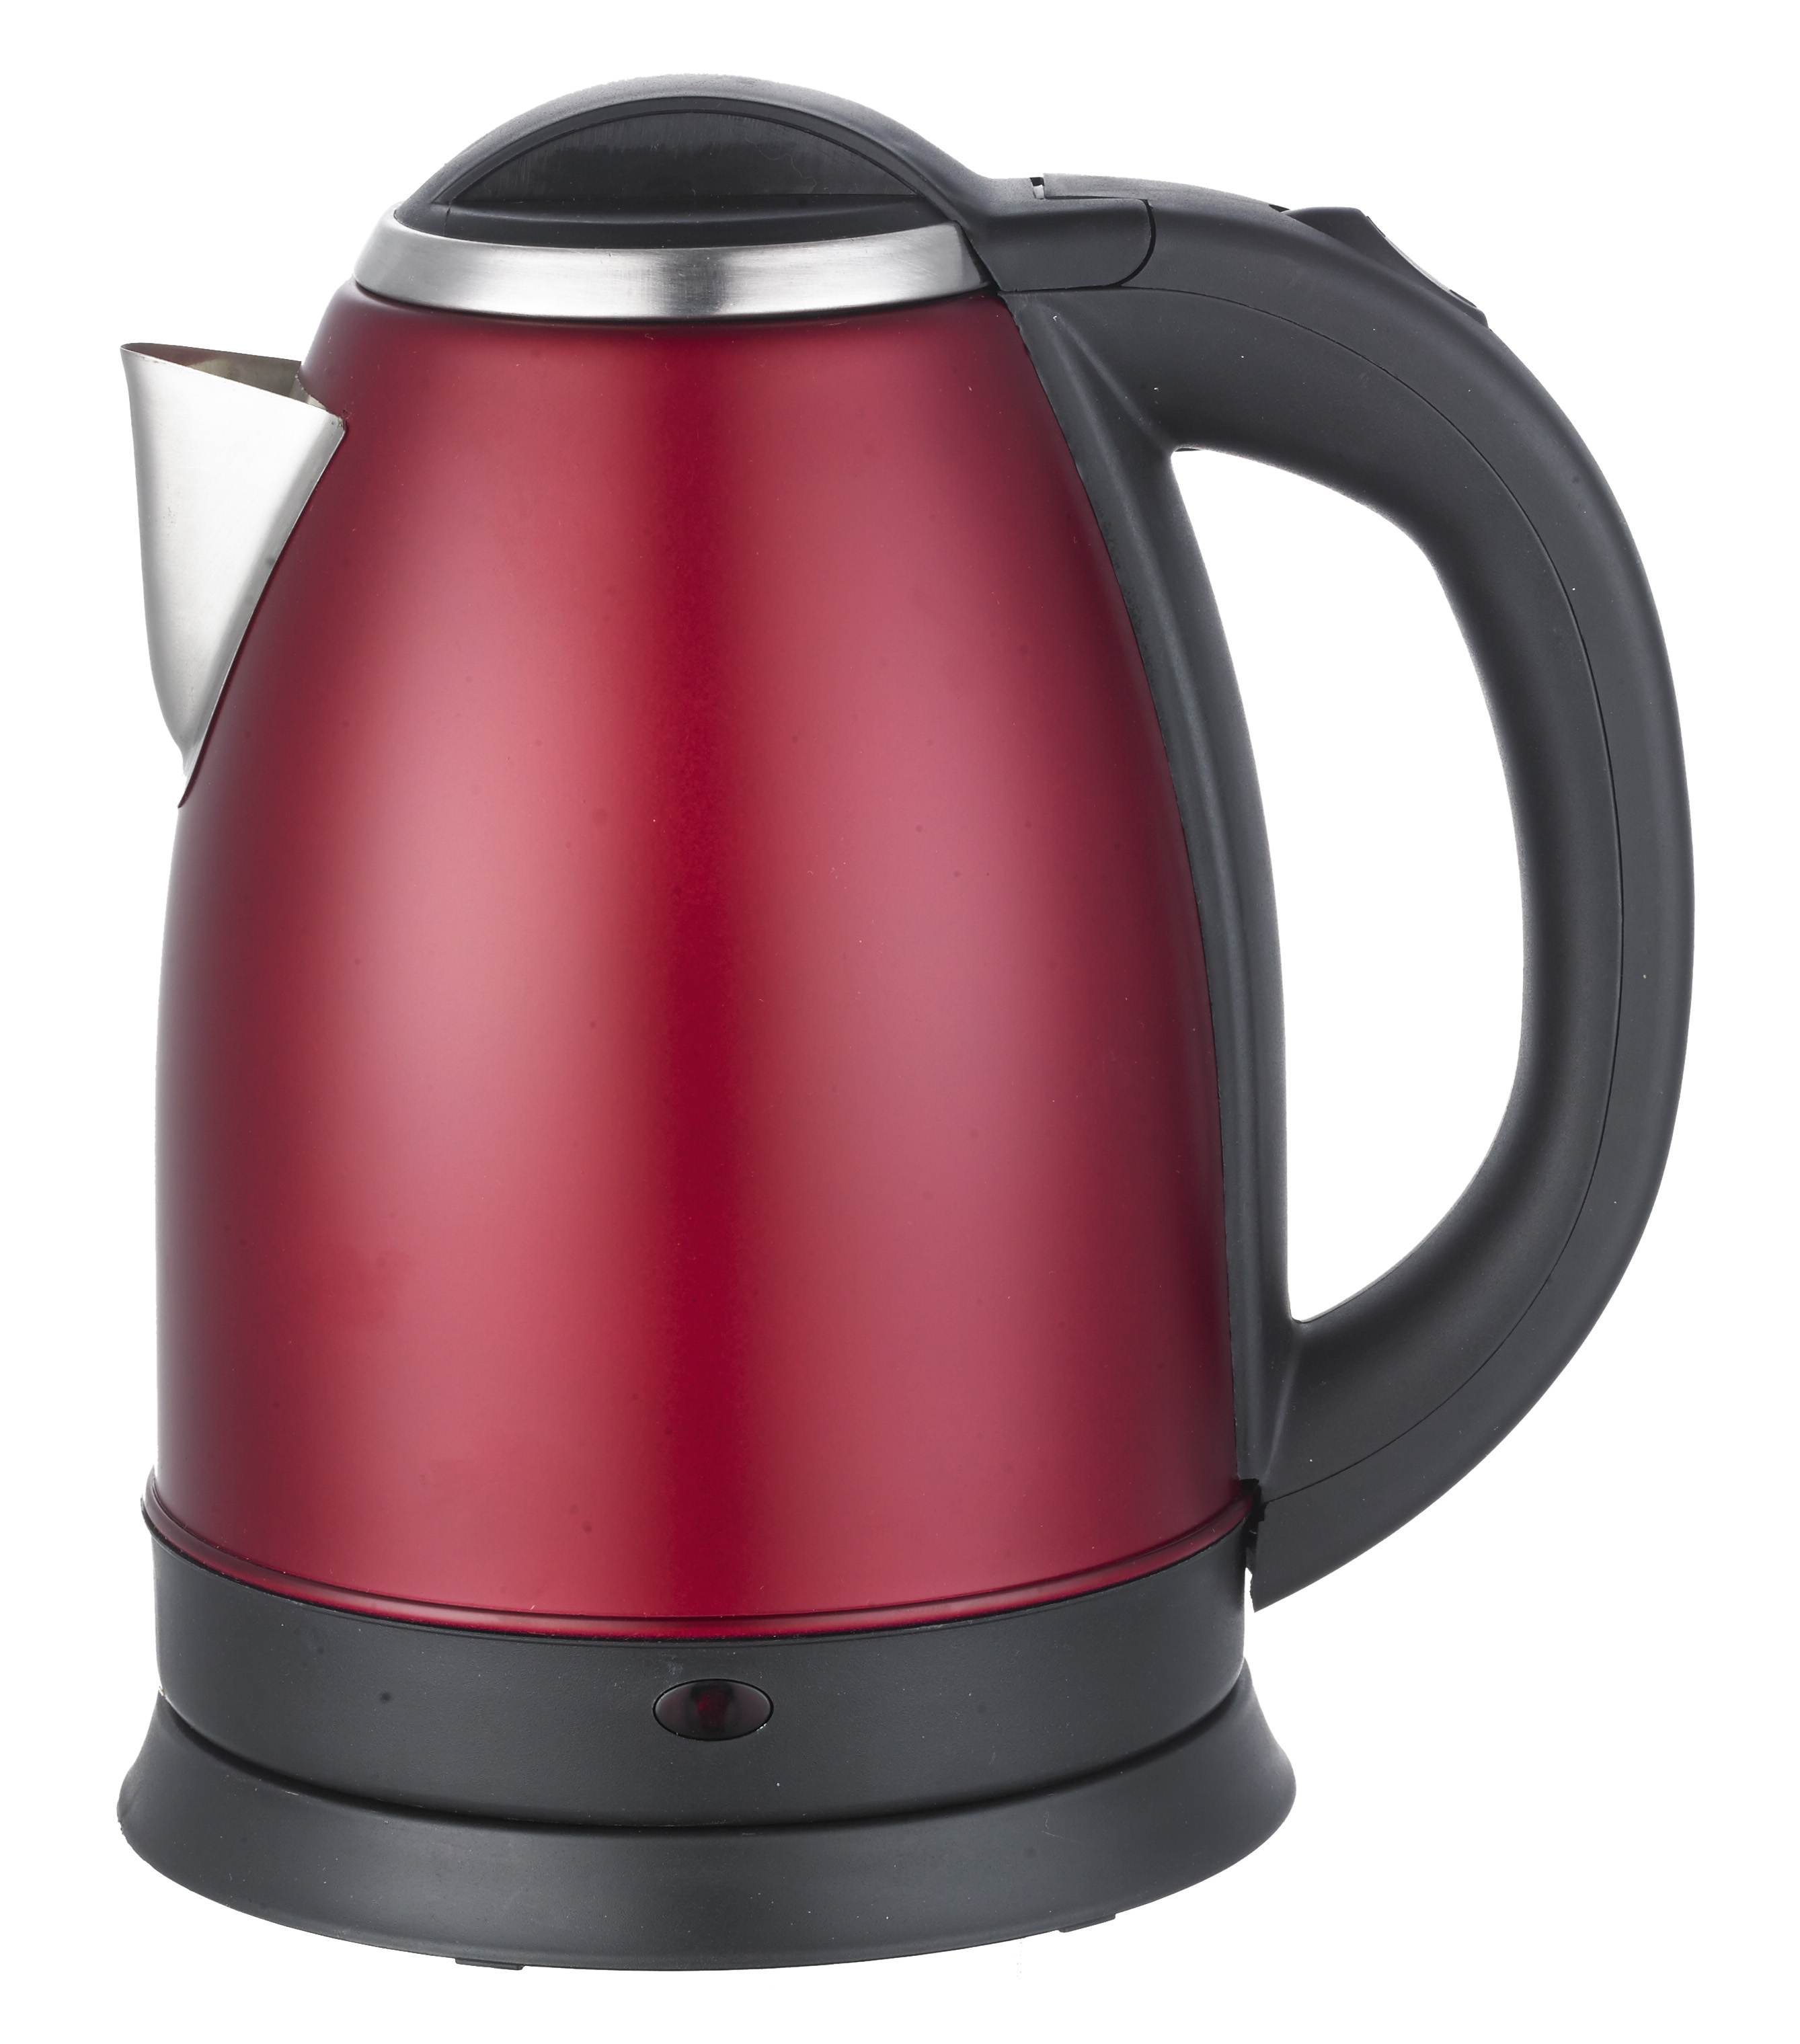 1.5L 1.8L hotel best 1500W stainless steel water electric kettle